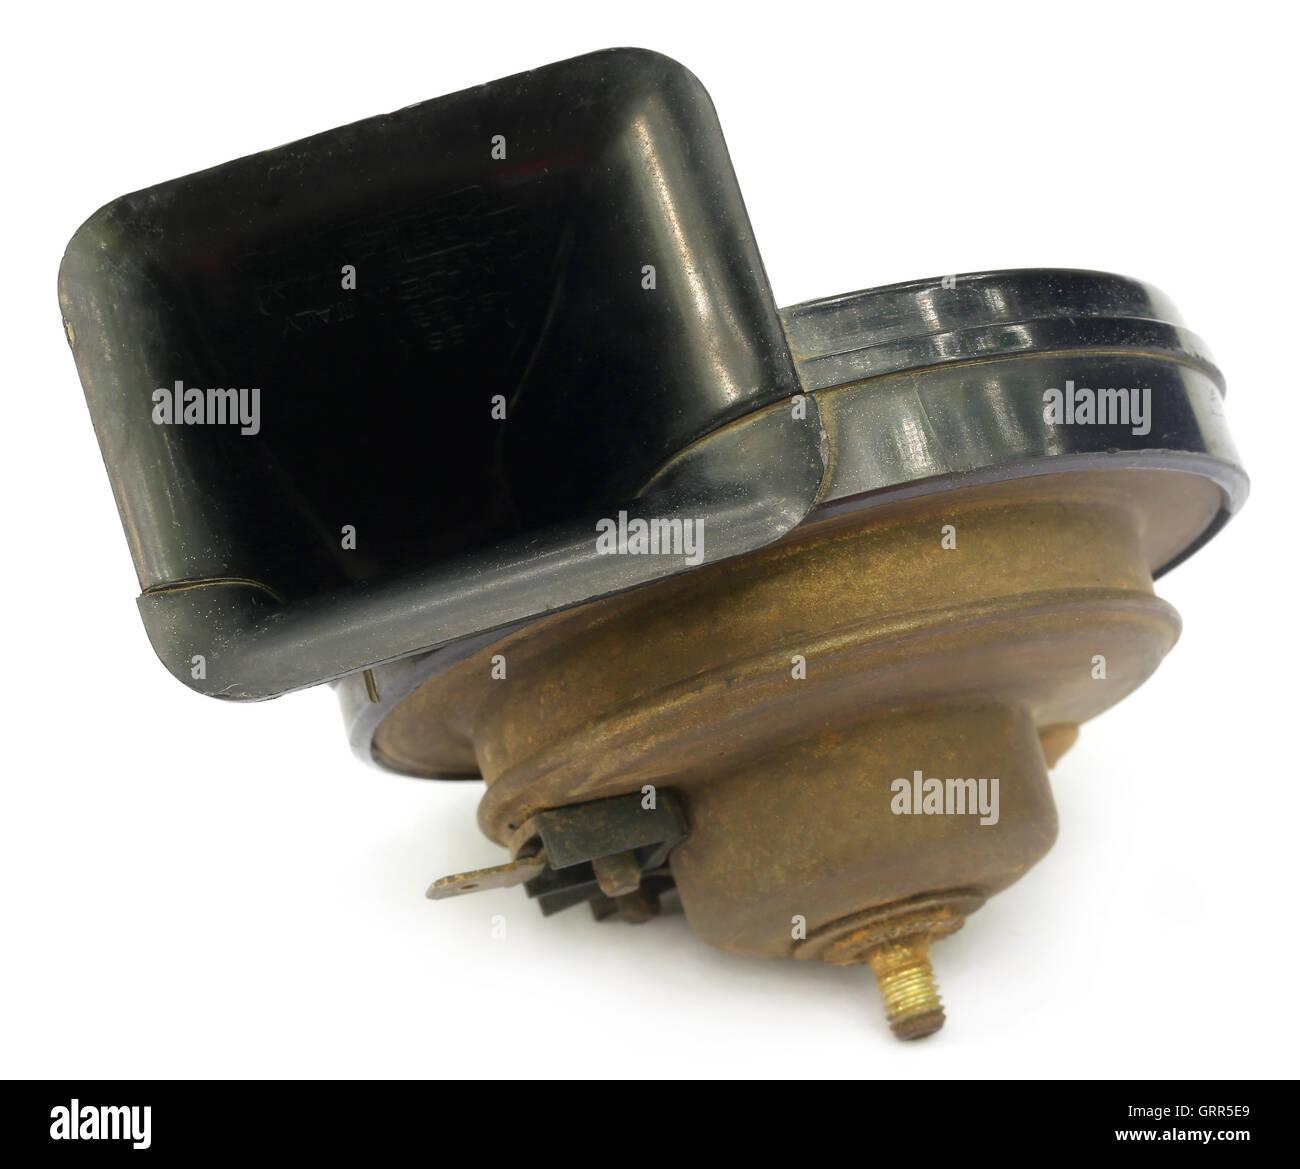 Vehicle horn over white background - Stock Image